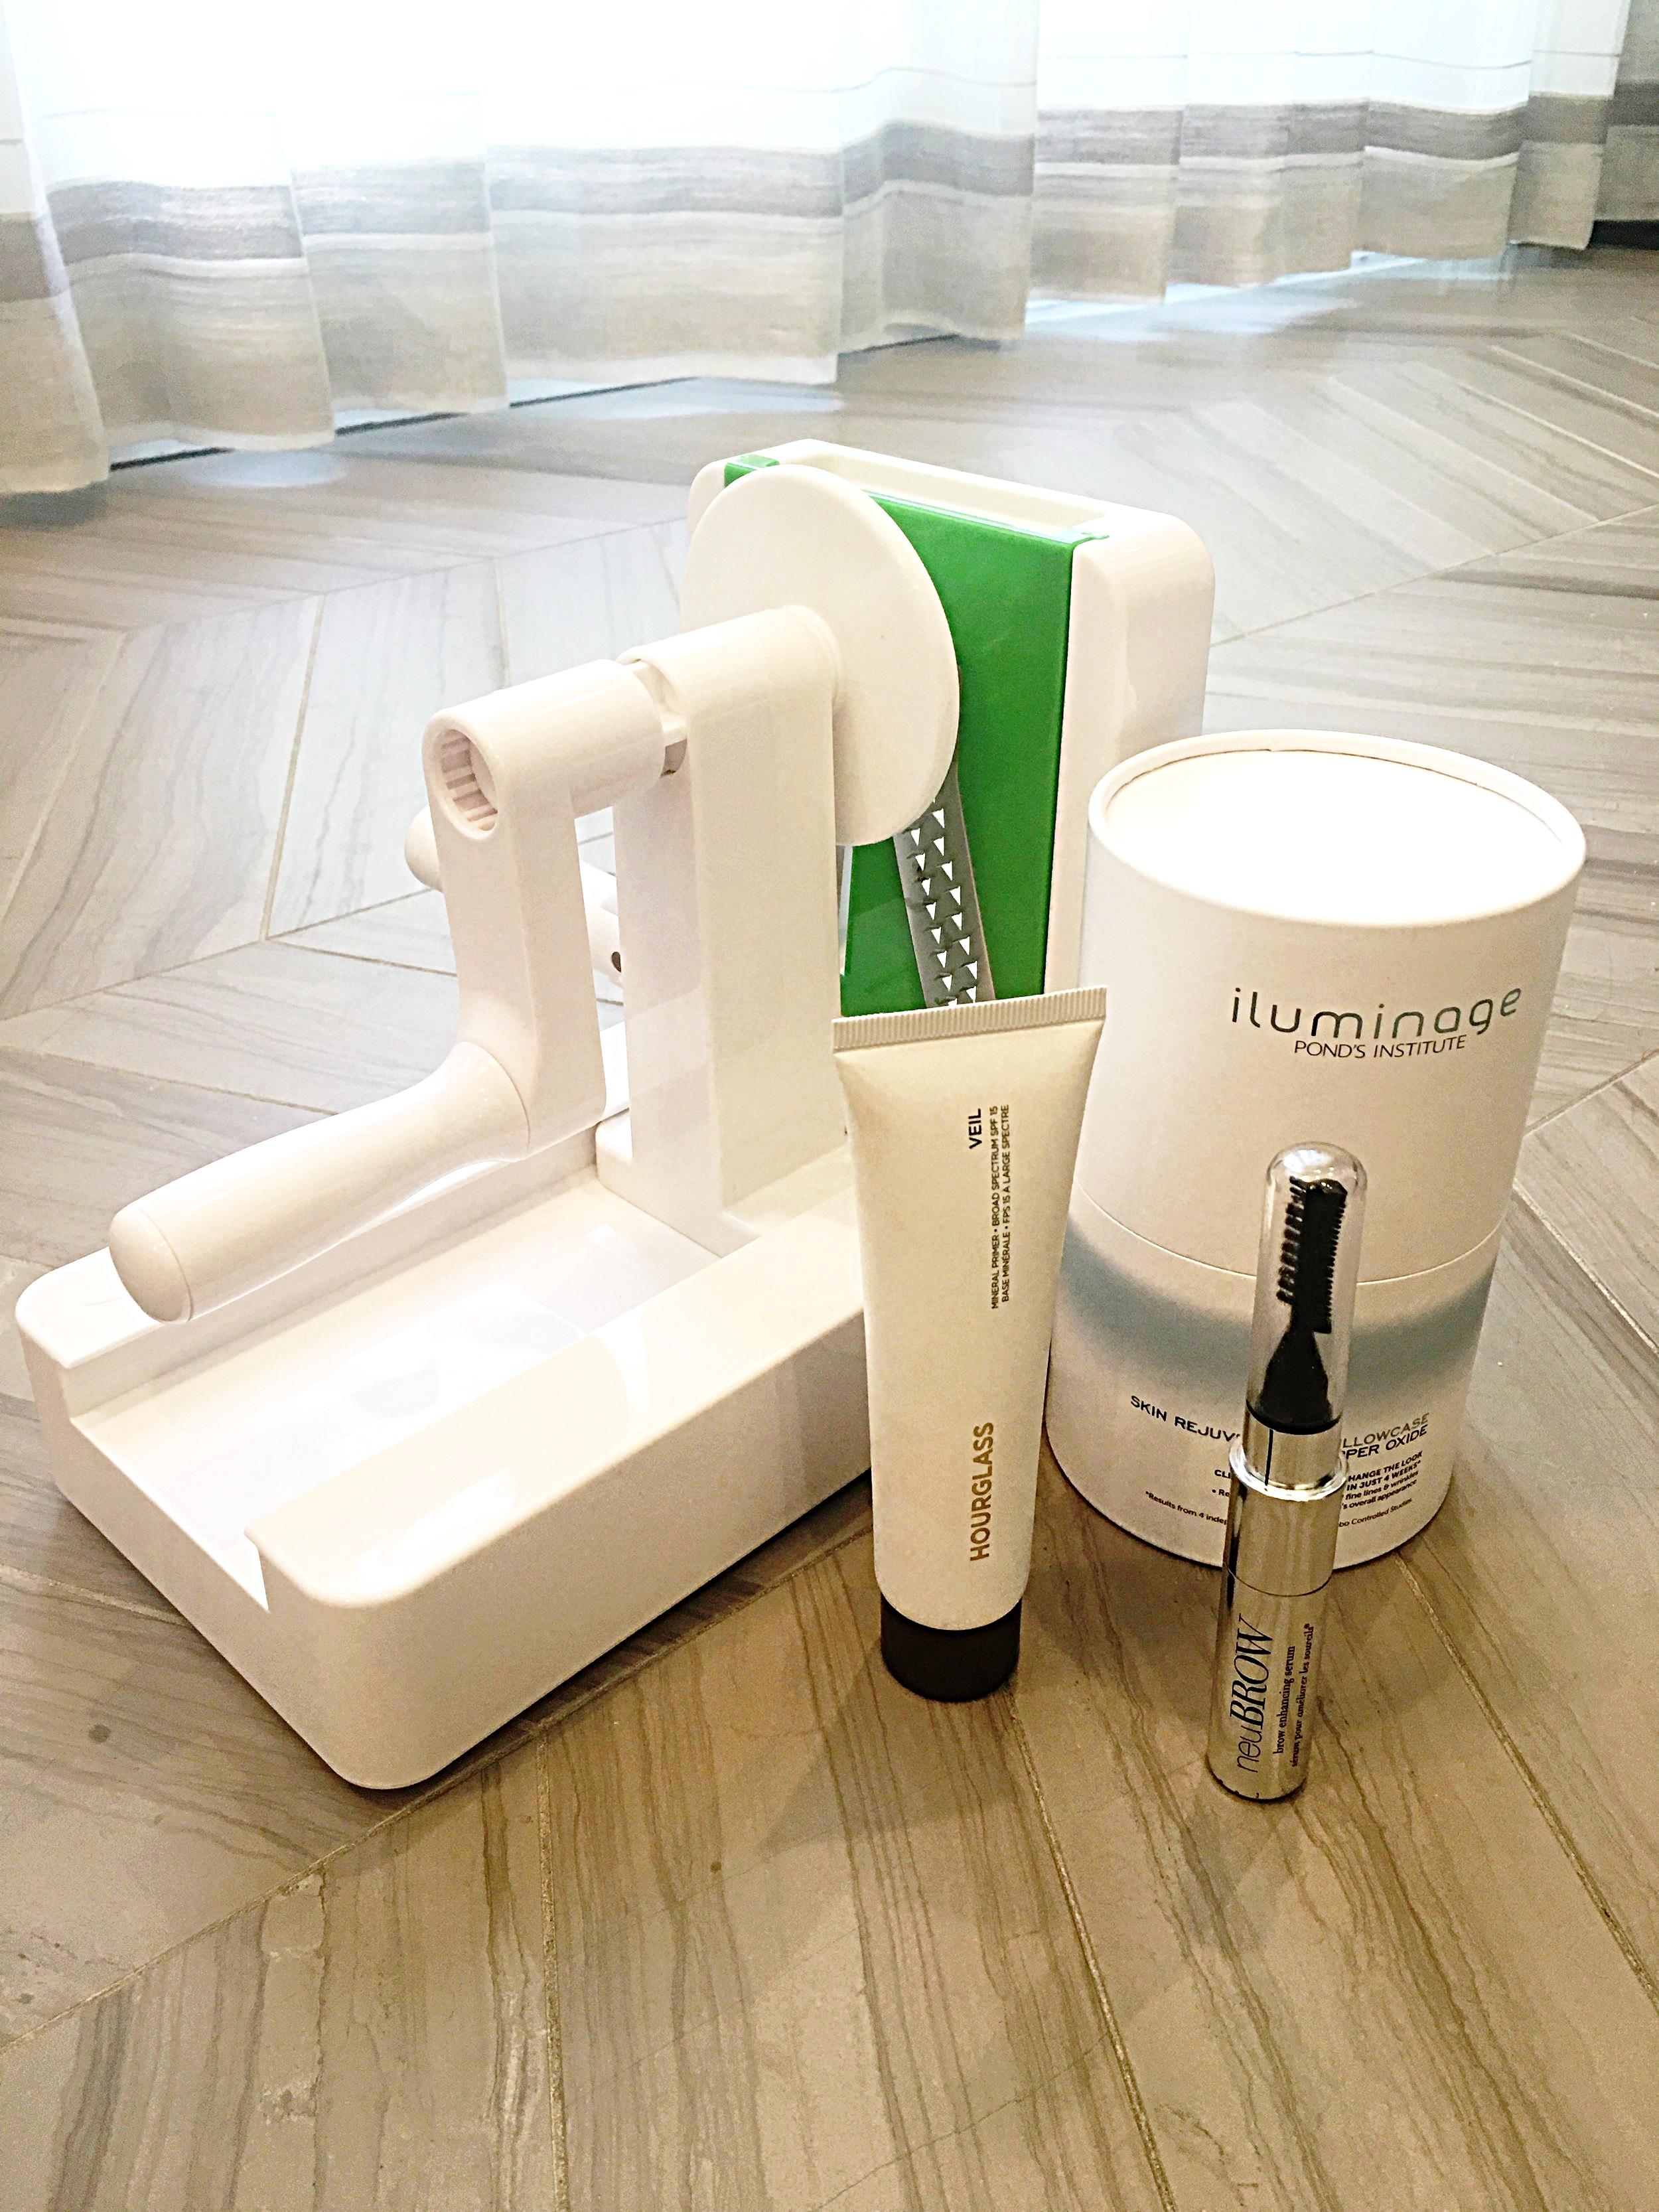 The Spiralizer ,  Illuminage pillow case ,  Neubrow eyebrow enhancer    and    Hourglass Veil primer